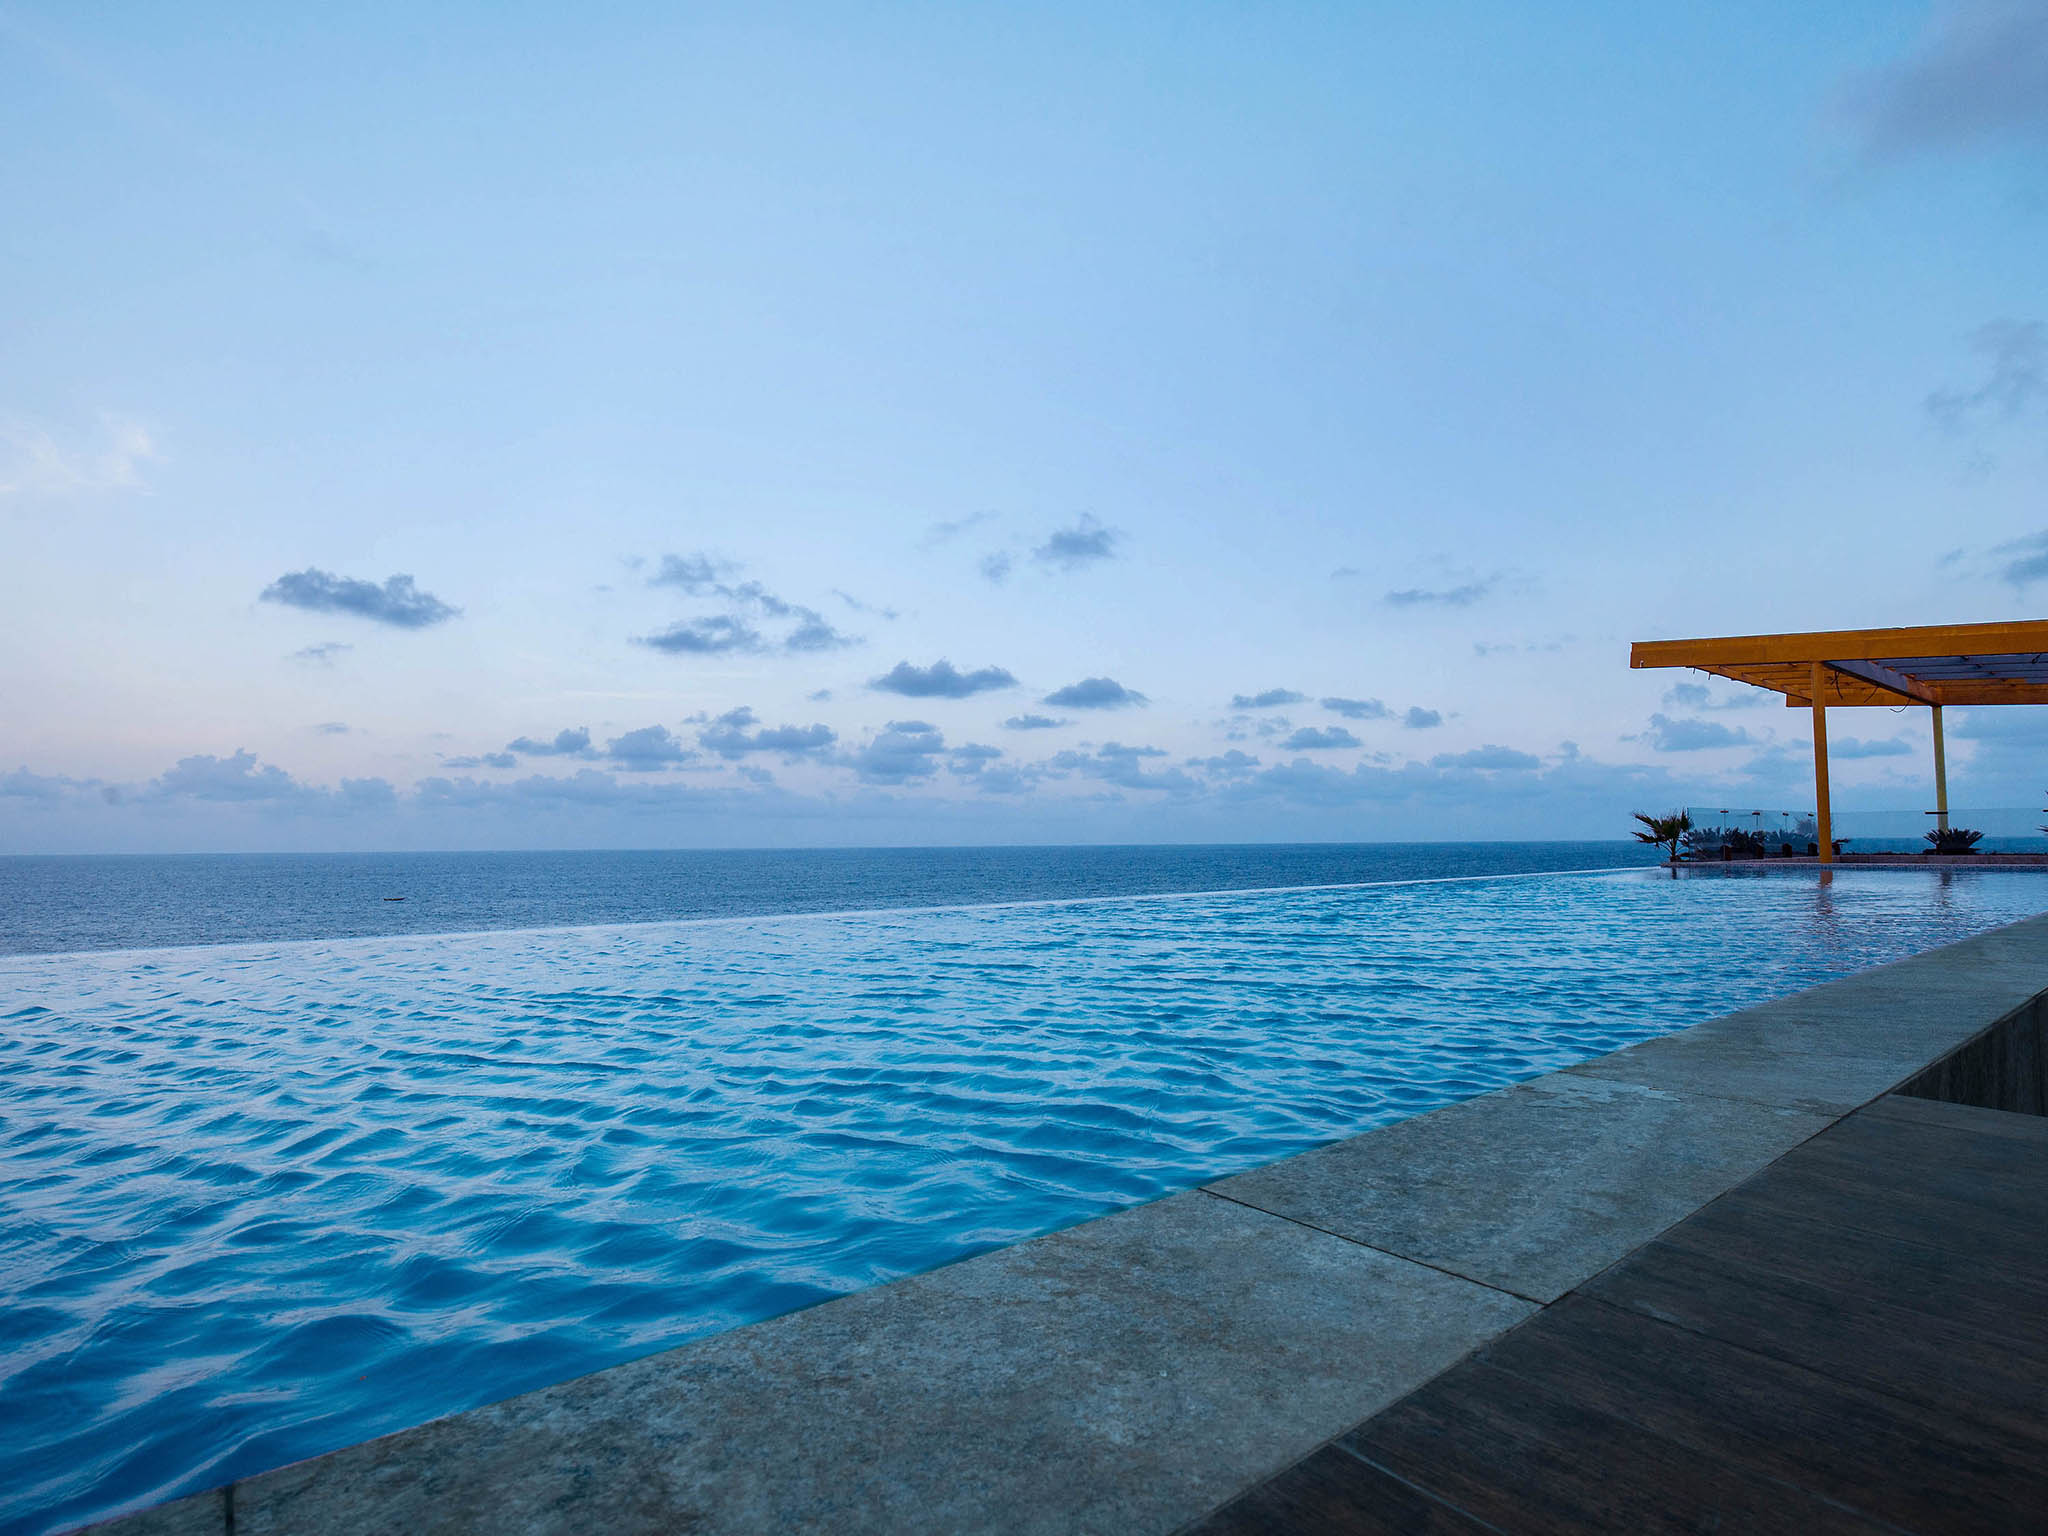 فندق - The Bheemli Resort - Managed by AccorHotels